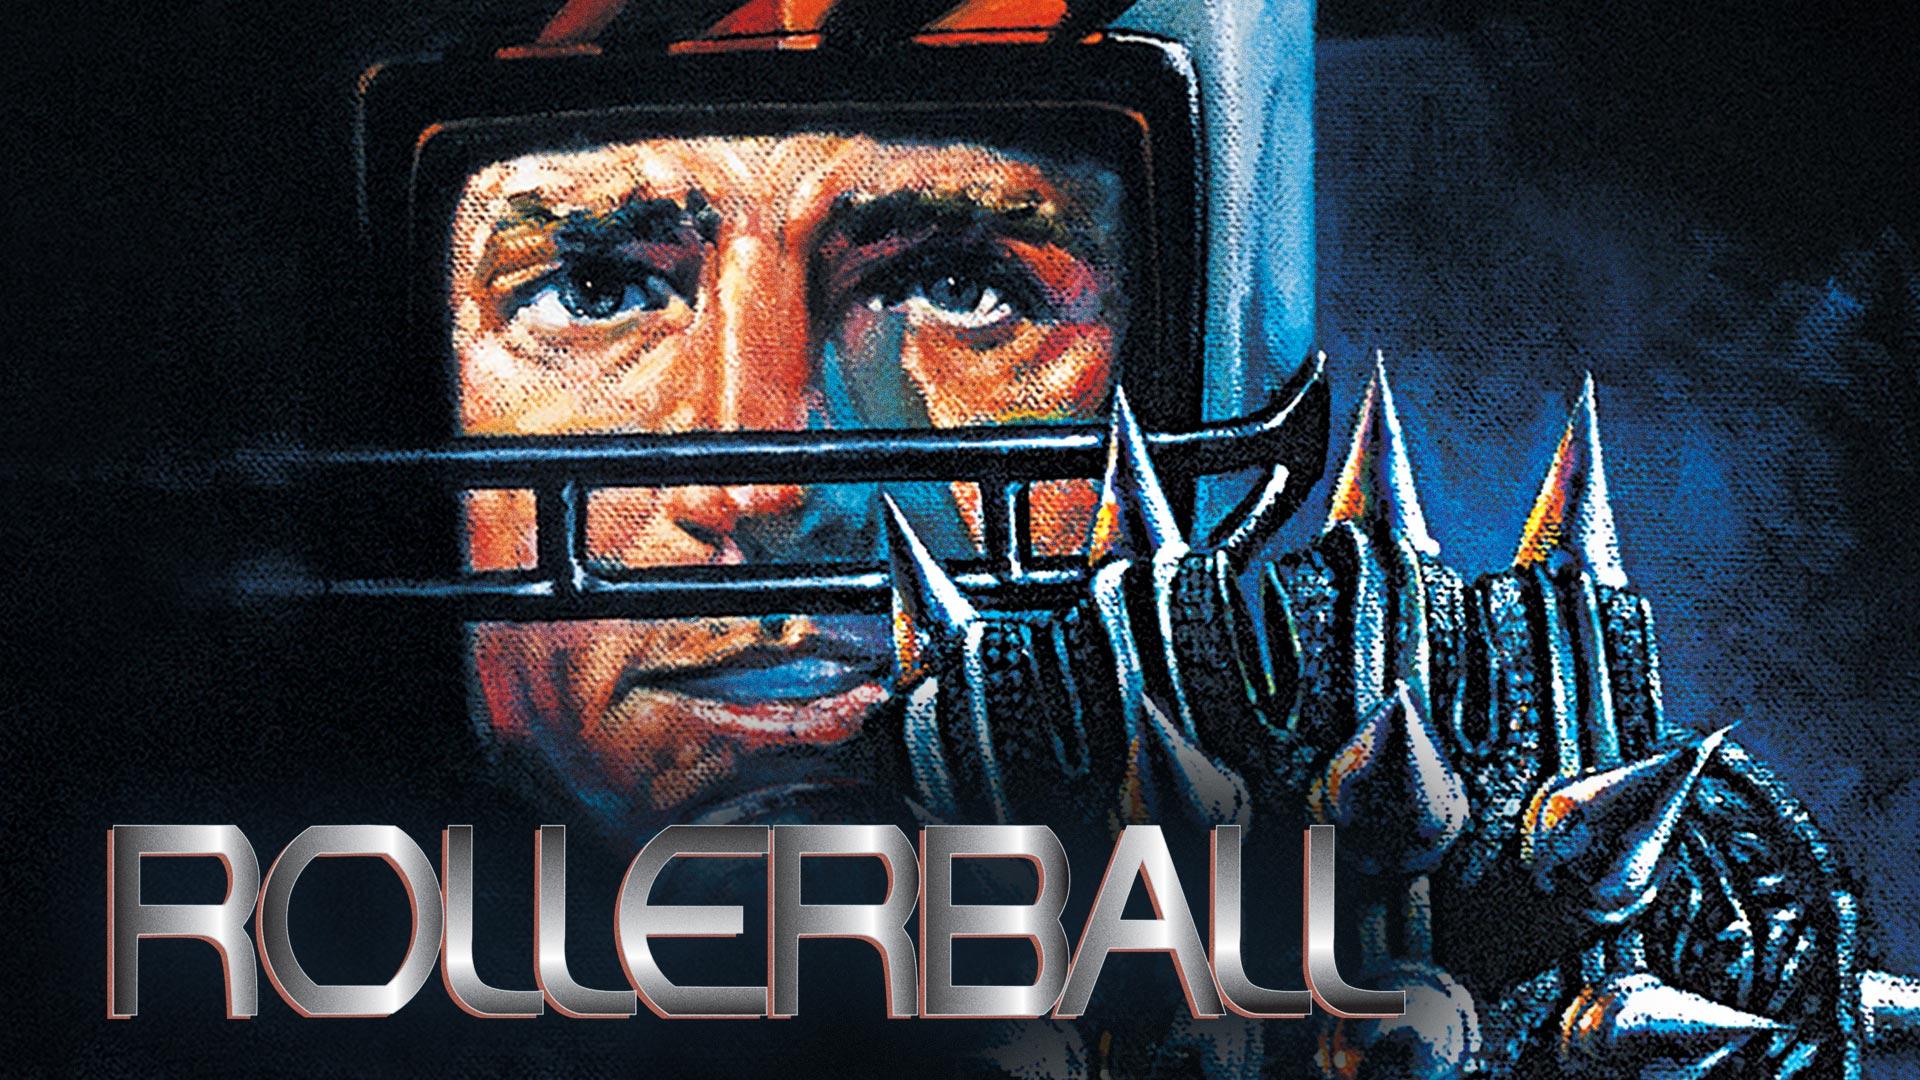 Rollerball [dt./OV]